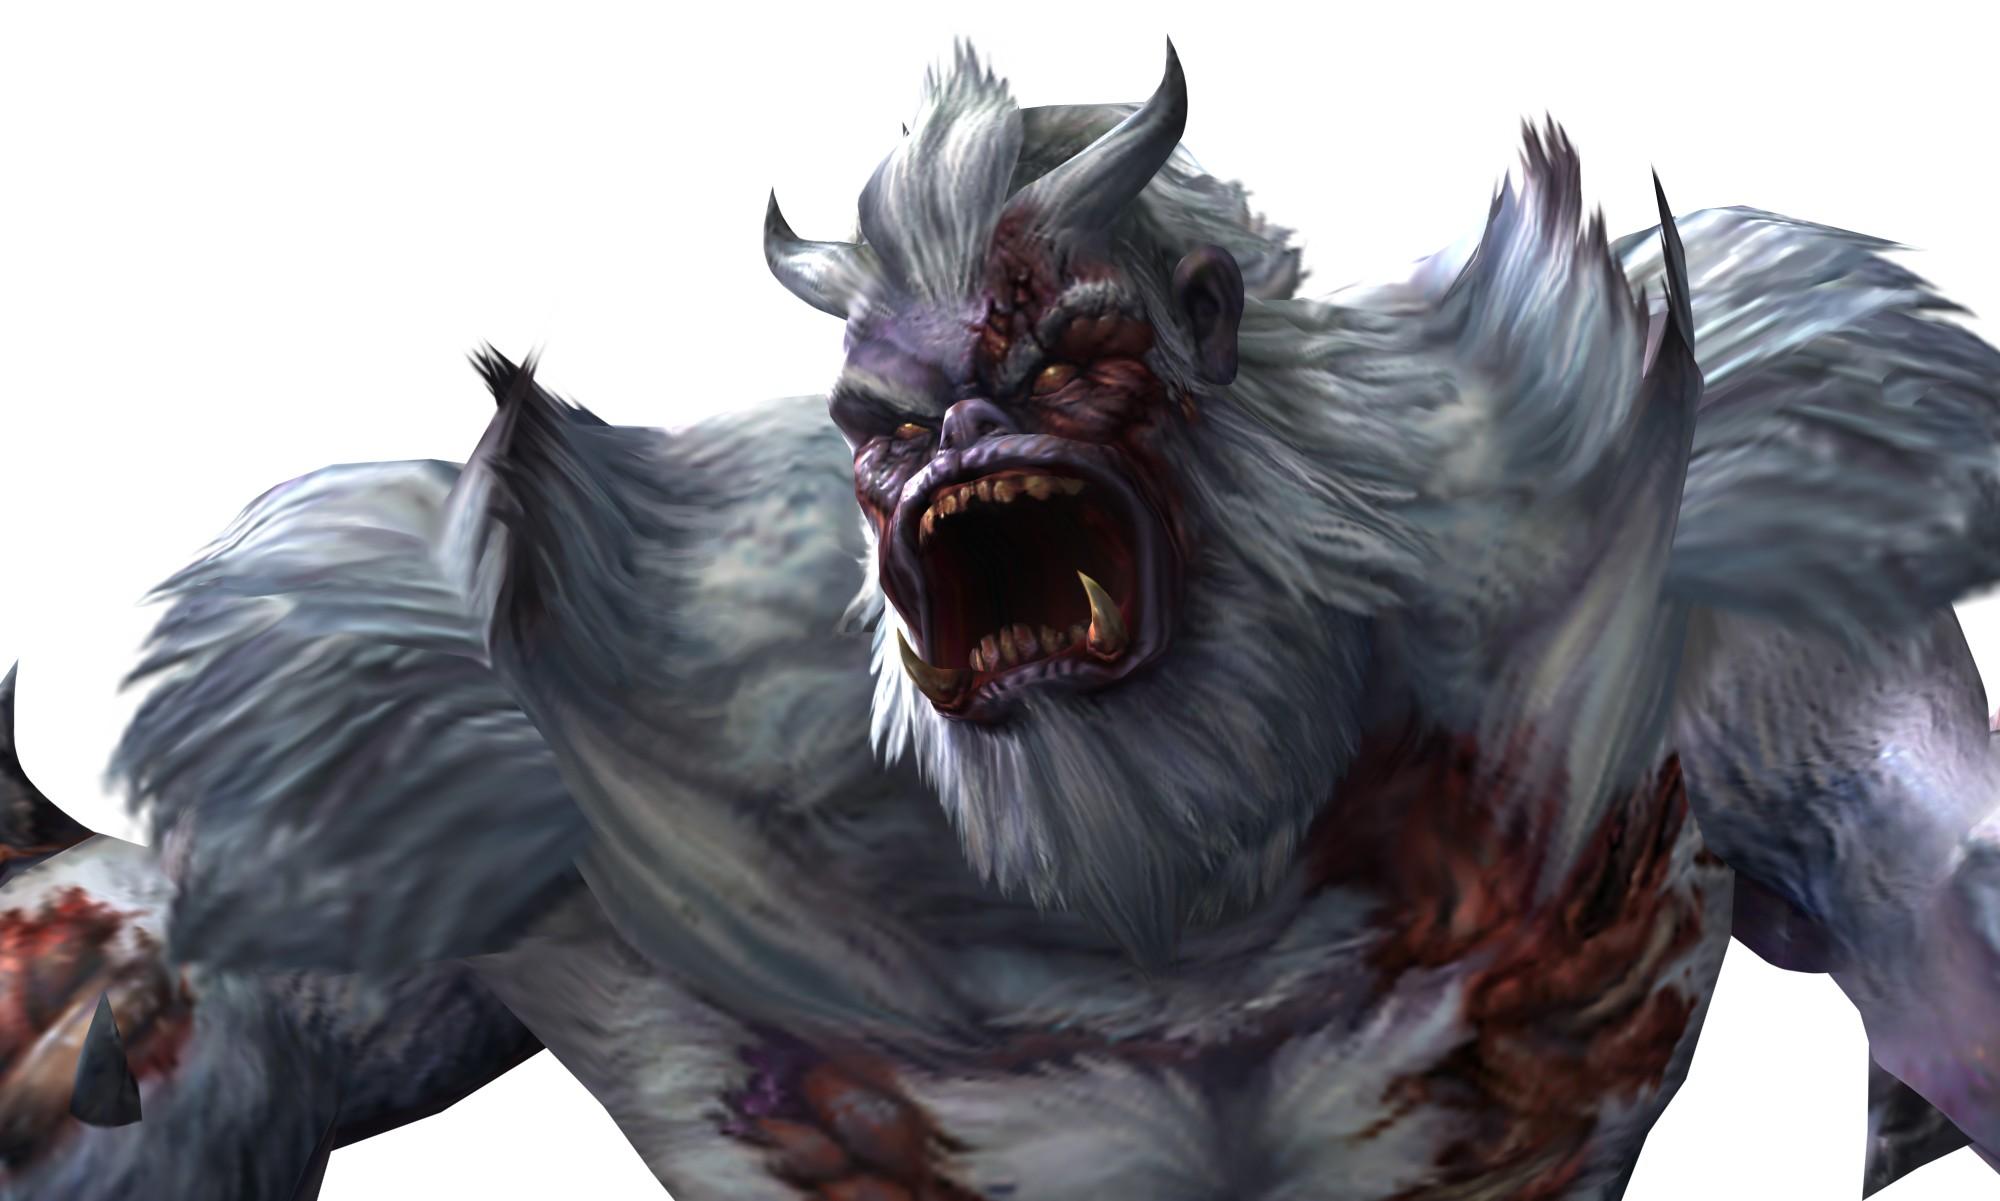 Beast1.jpg